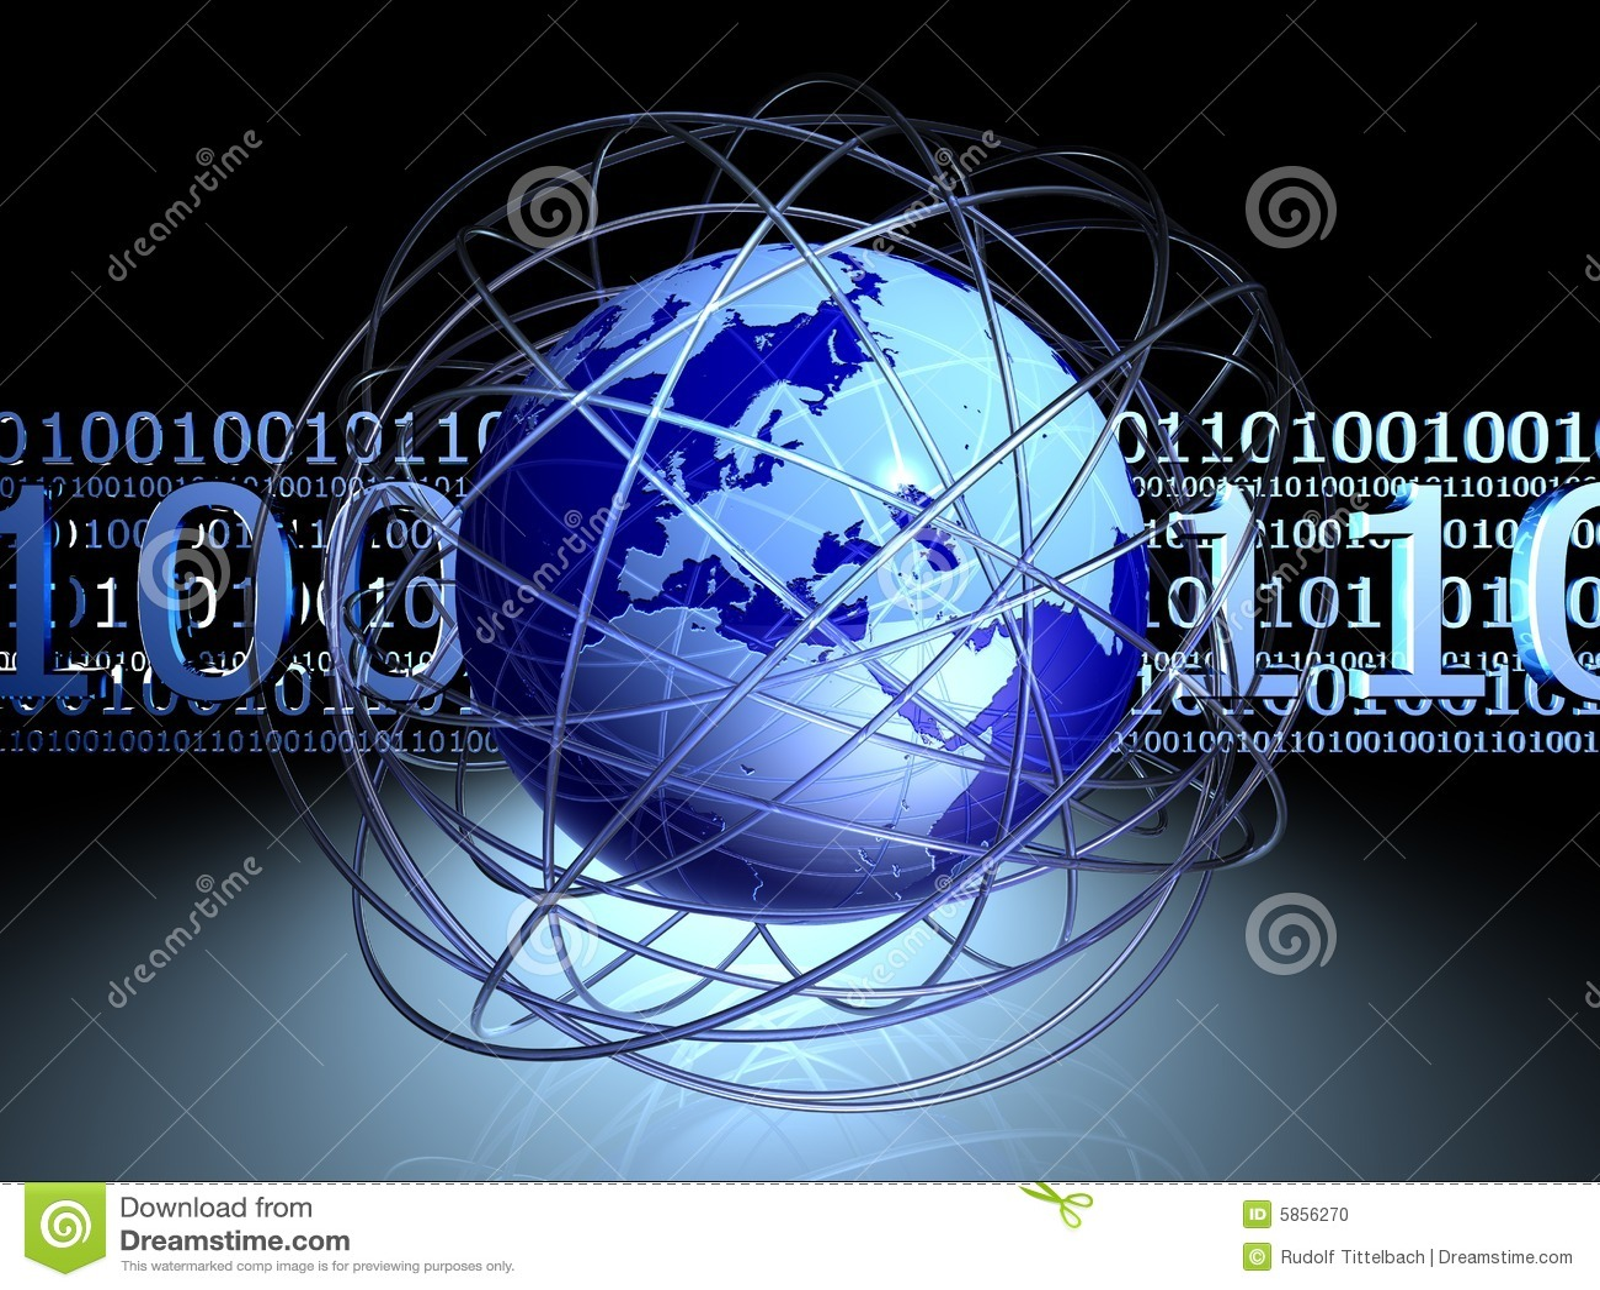 Digital chaos around globe